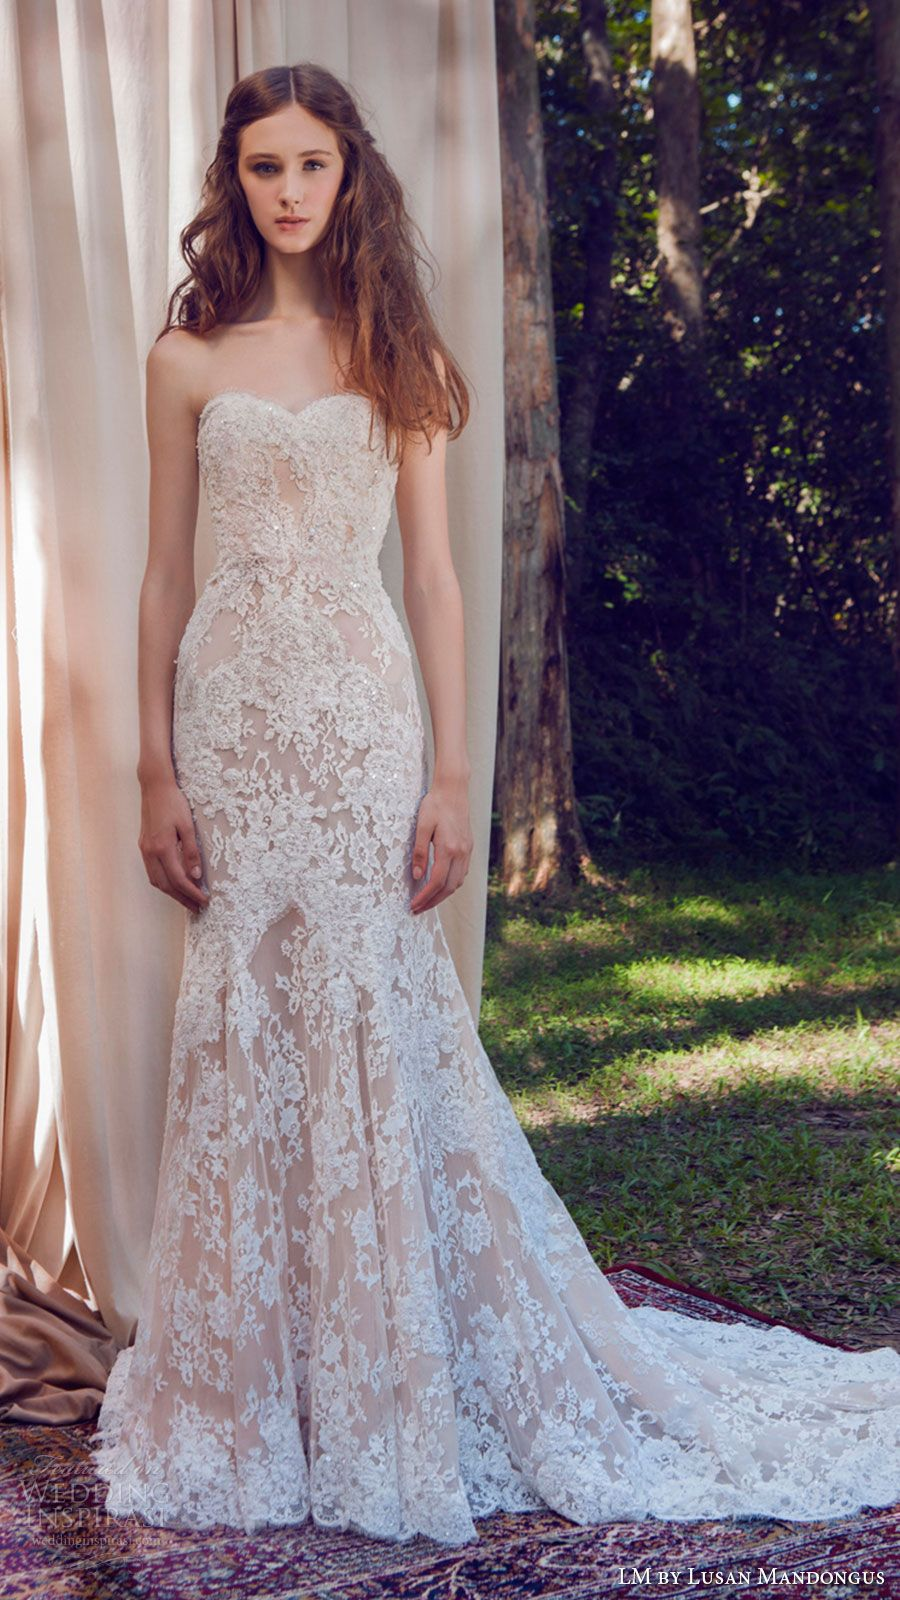 Bonafidebride diy project sweet whimsical paper lanterns - Lm By Lusan Mandongus 2017 Wedding Dresses